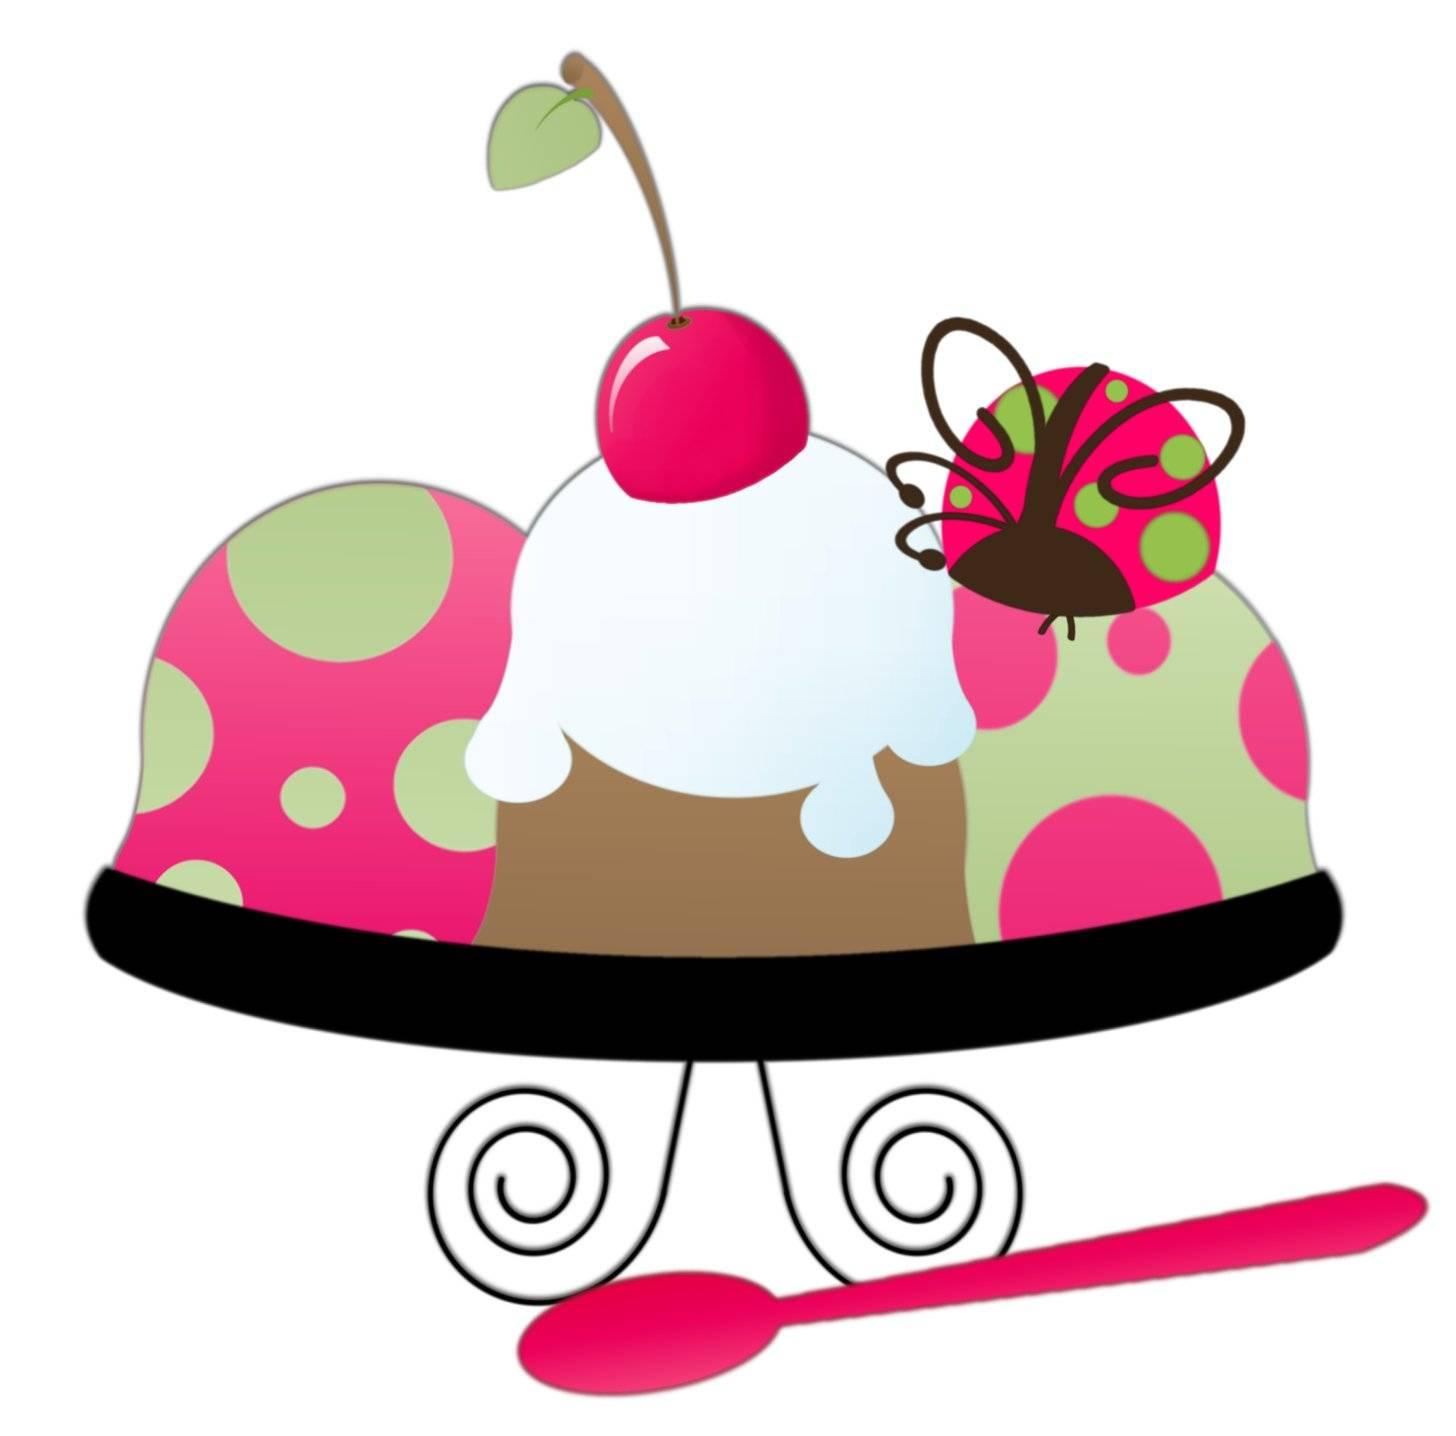 1456x1436 Ice Cream Sundae Clipart Free Images 8